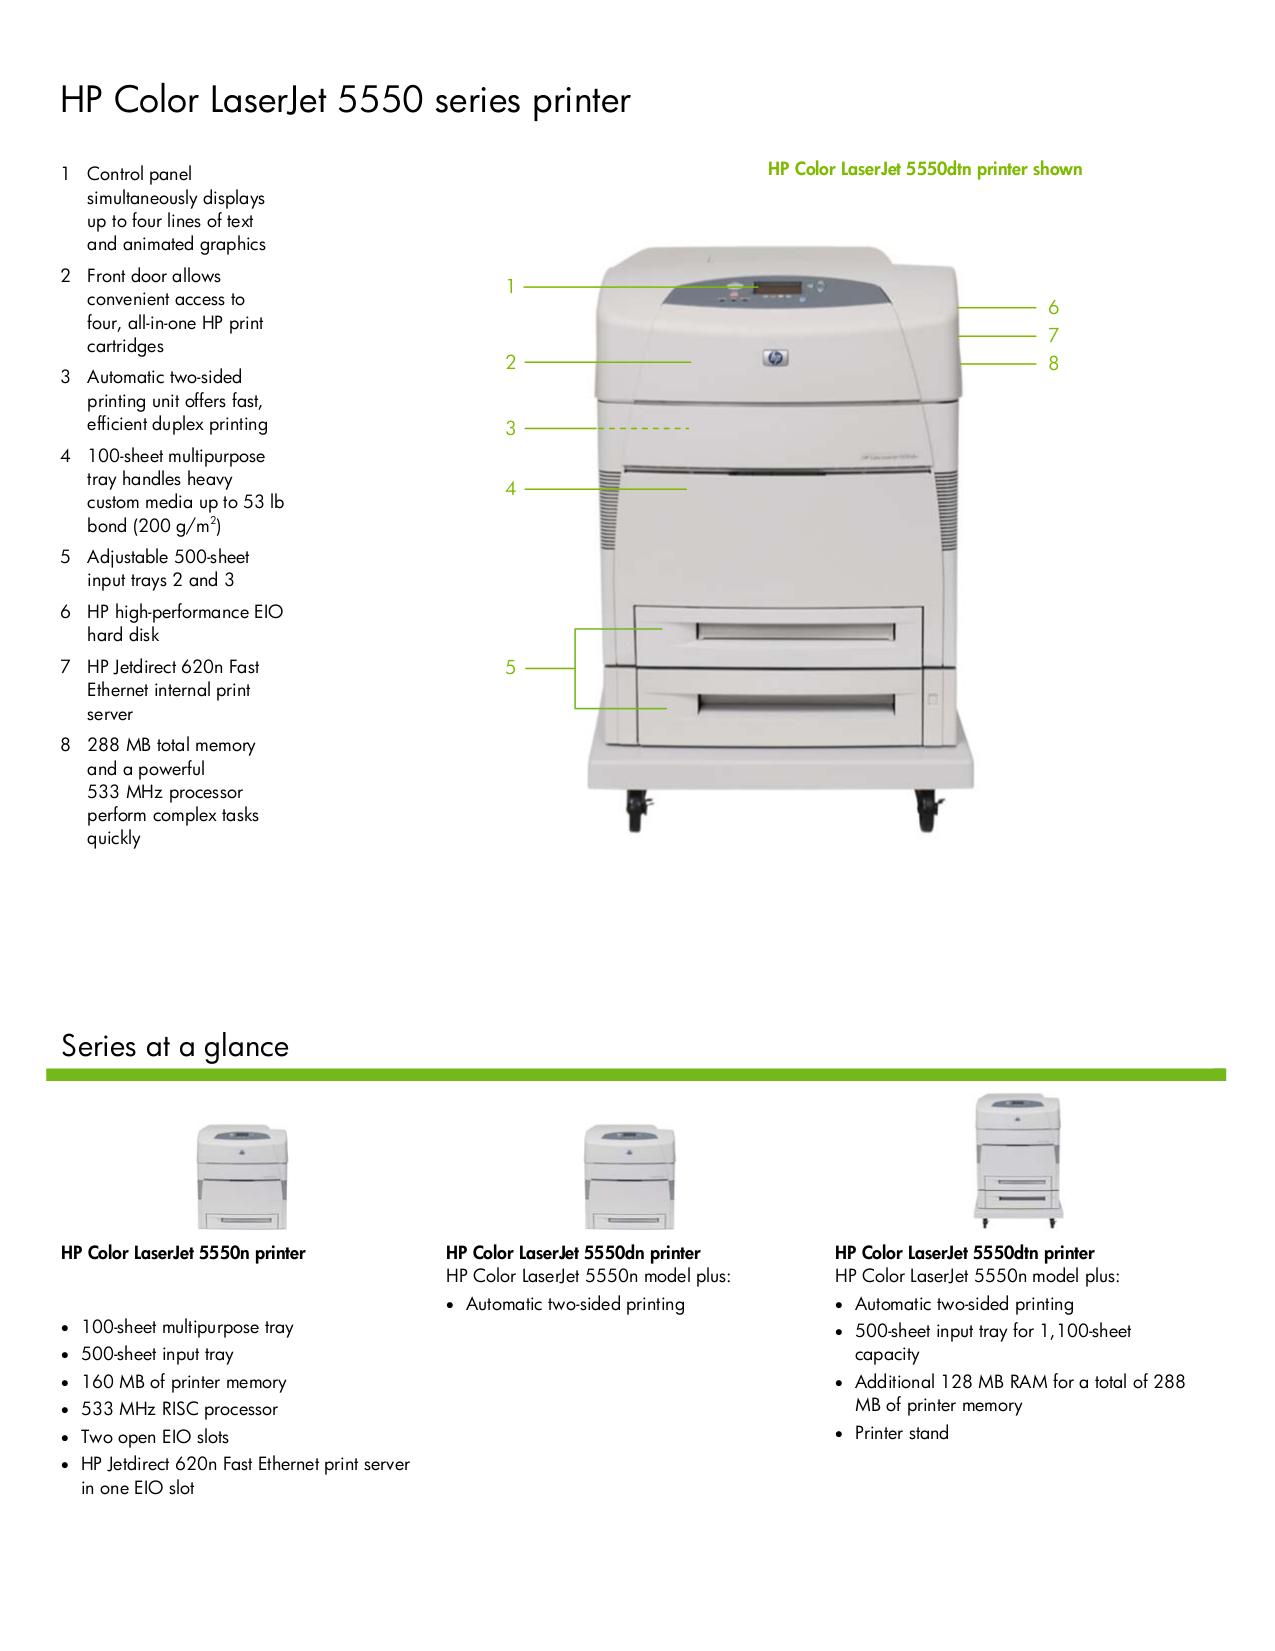 hp color laserjet 4650dtn user manual Array - pdf manual for hp printer  laserjetcolor laserjet 5550n rh umlib com